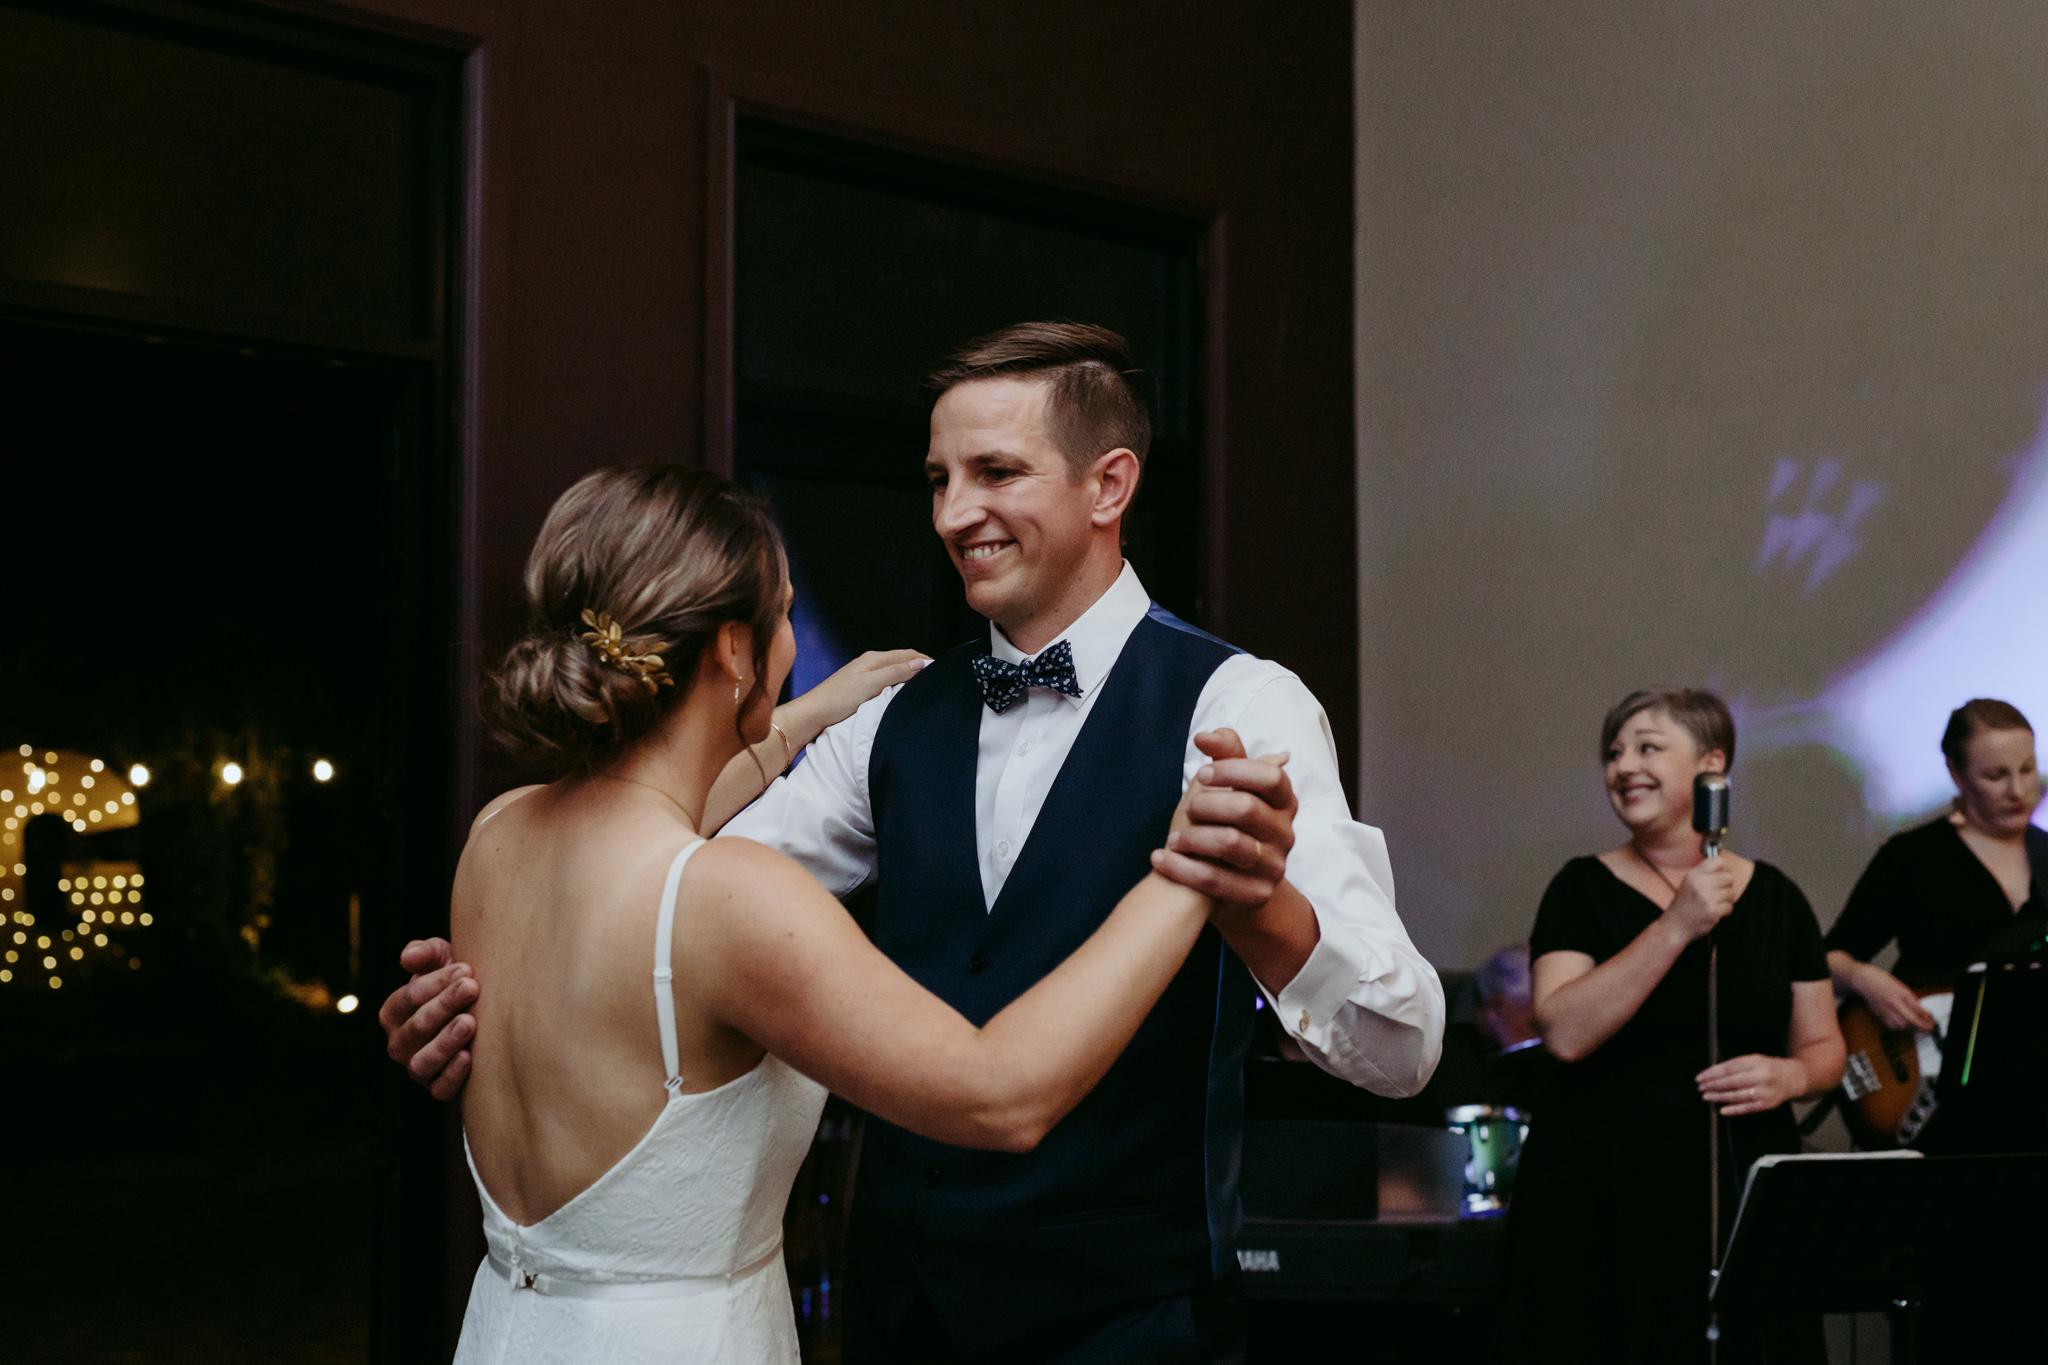 Erin Latimore Mudgee Canberra Wedding Photographer ROSEBANK GUESTHOUSE OLD THEATRE TONIC MILLTHORPE_787.JPG